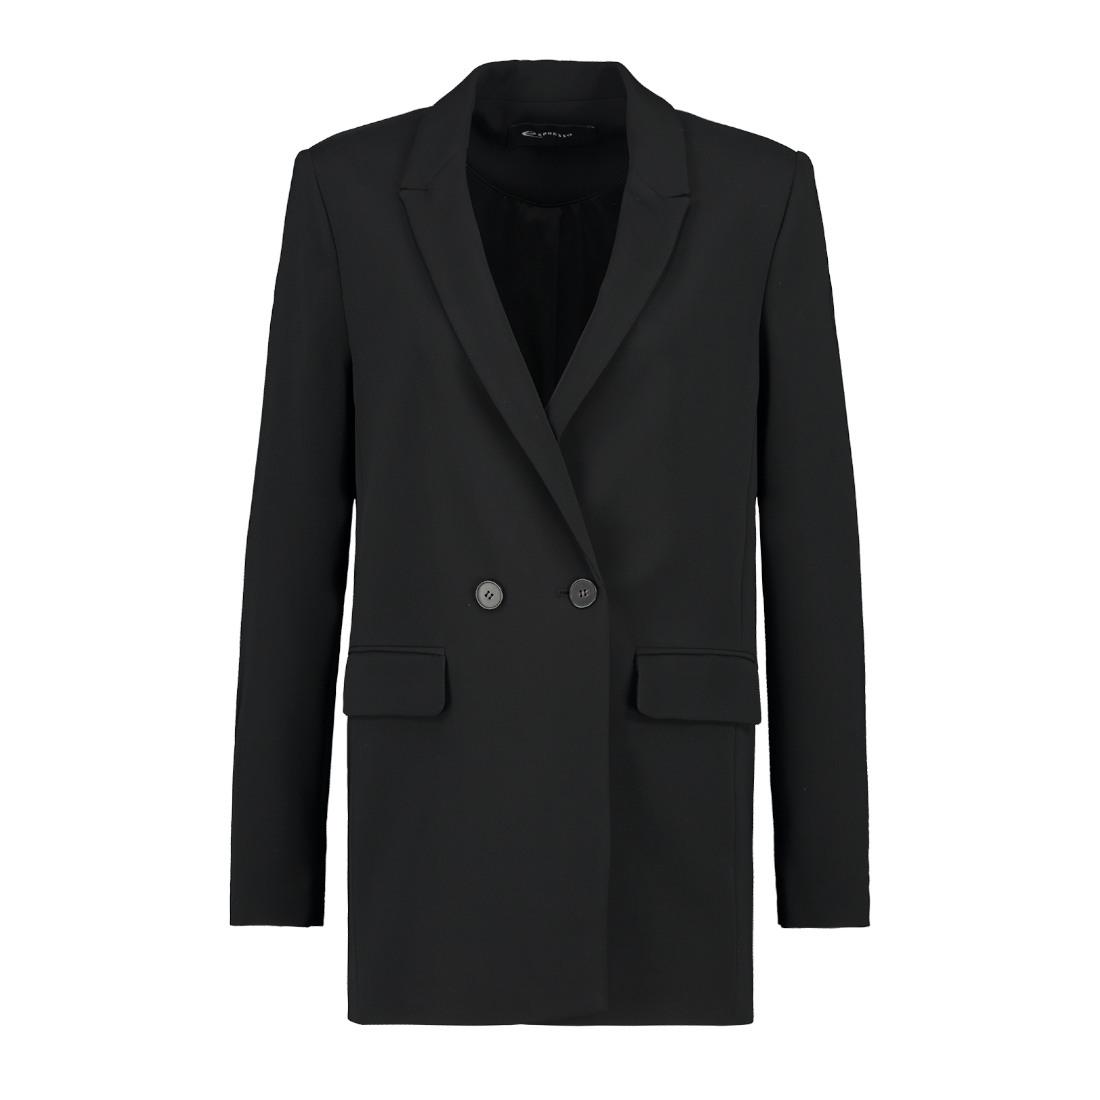 Smit Mode:  Expresso blazer 193klara in het Zwart